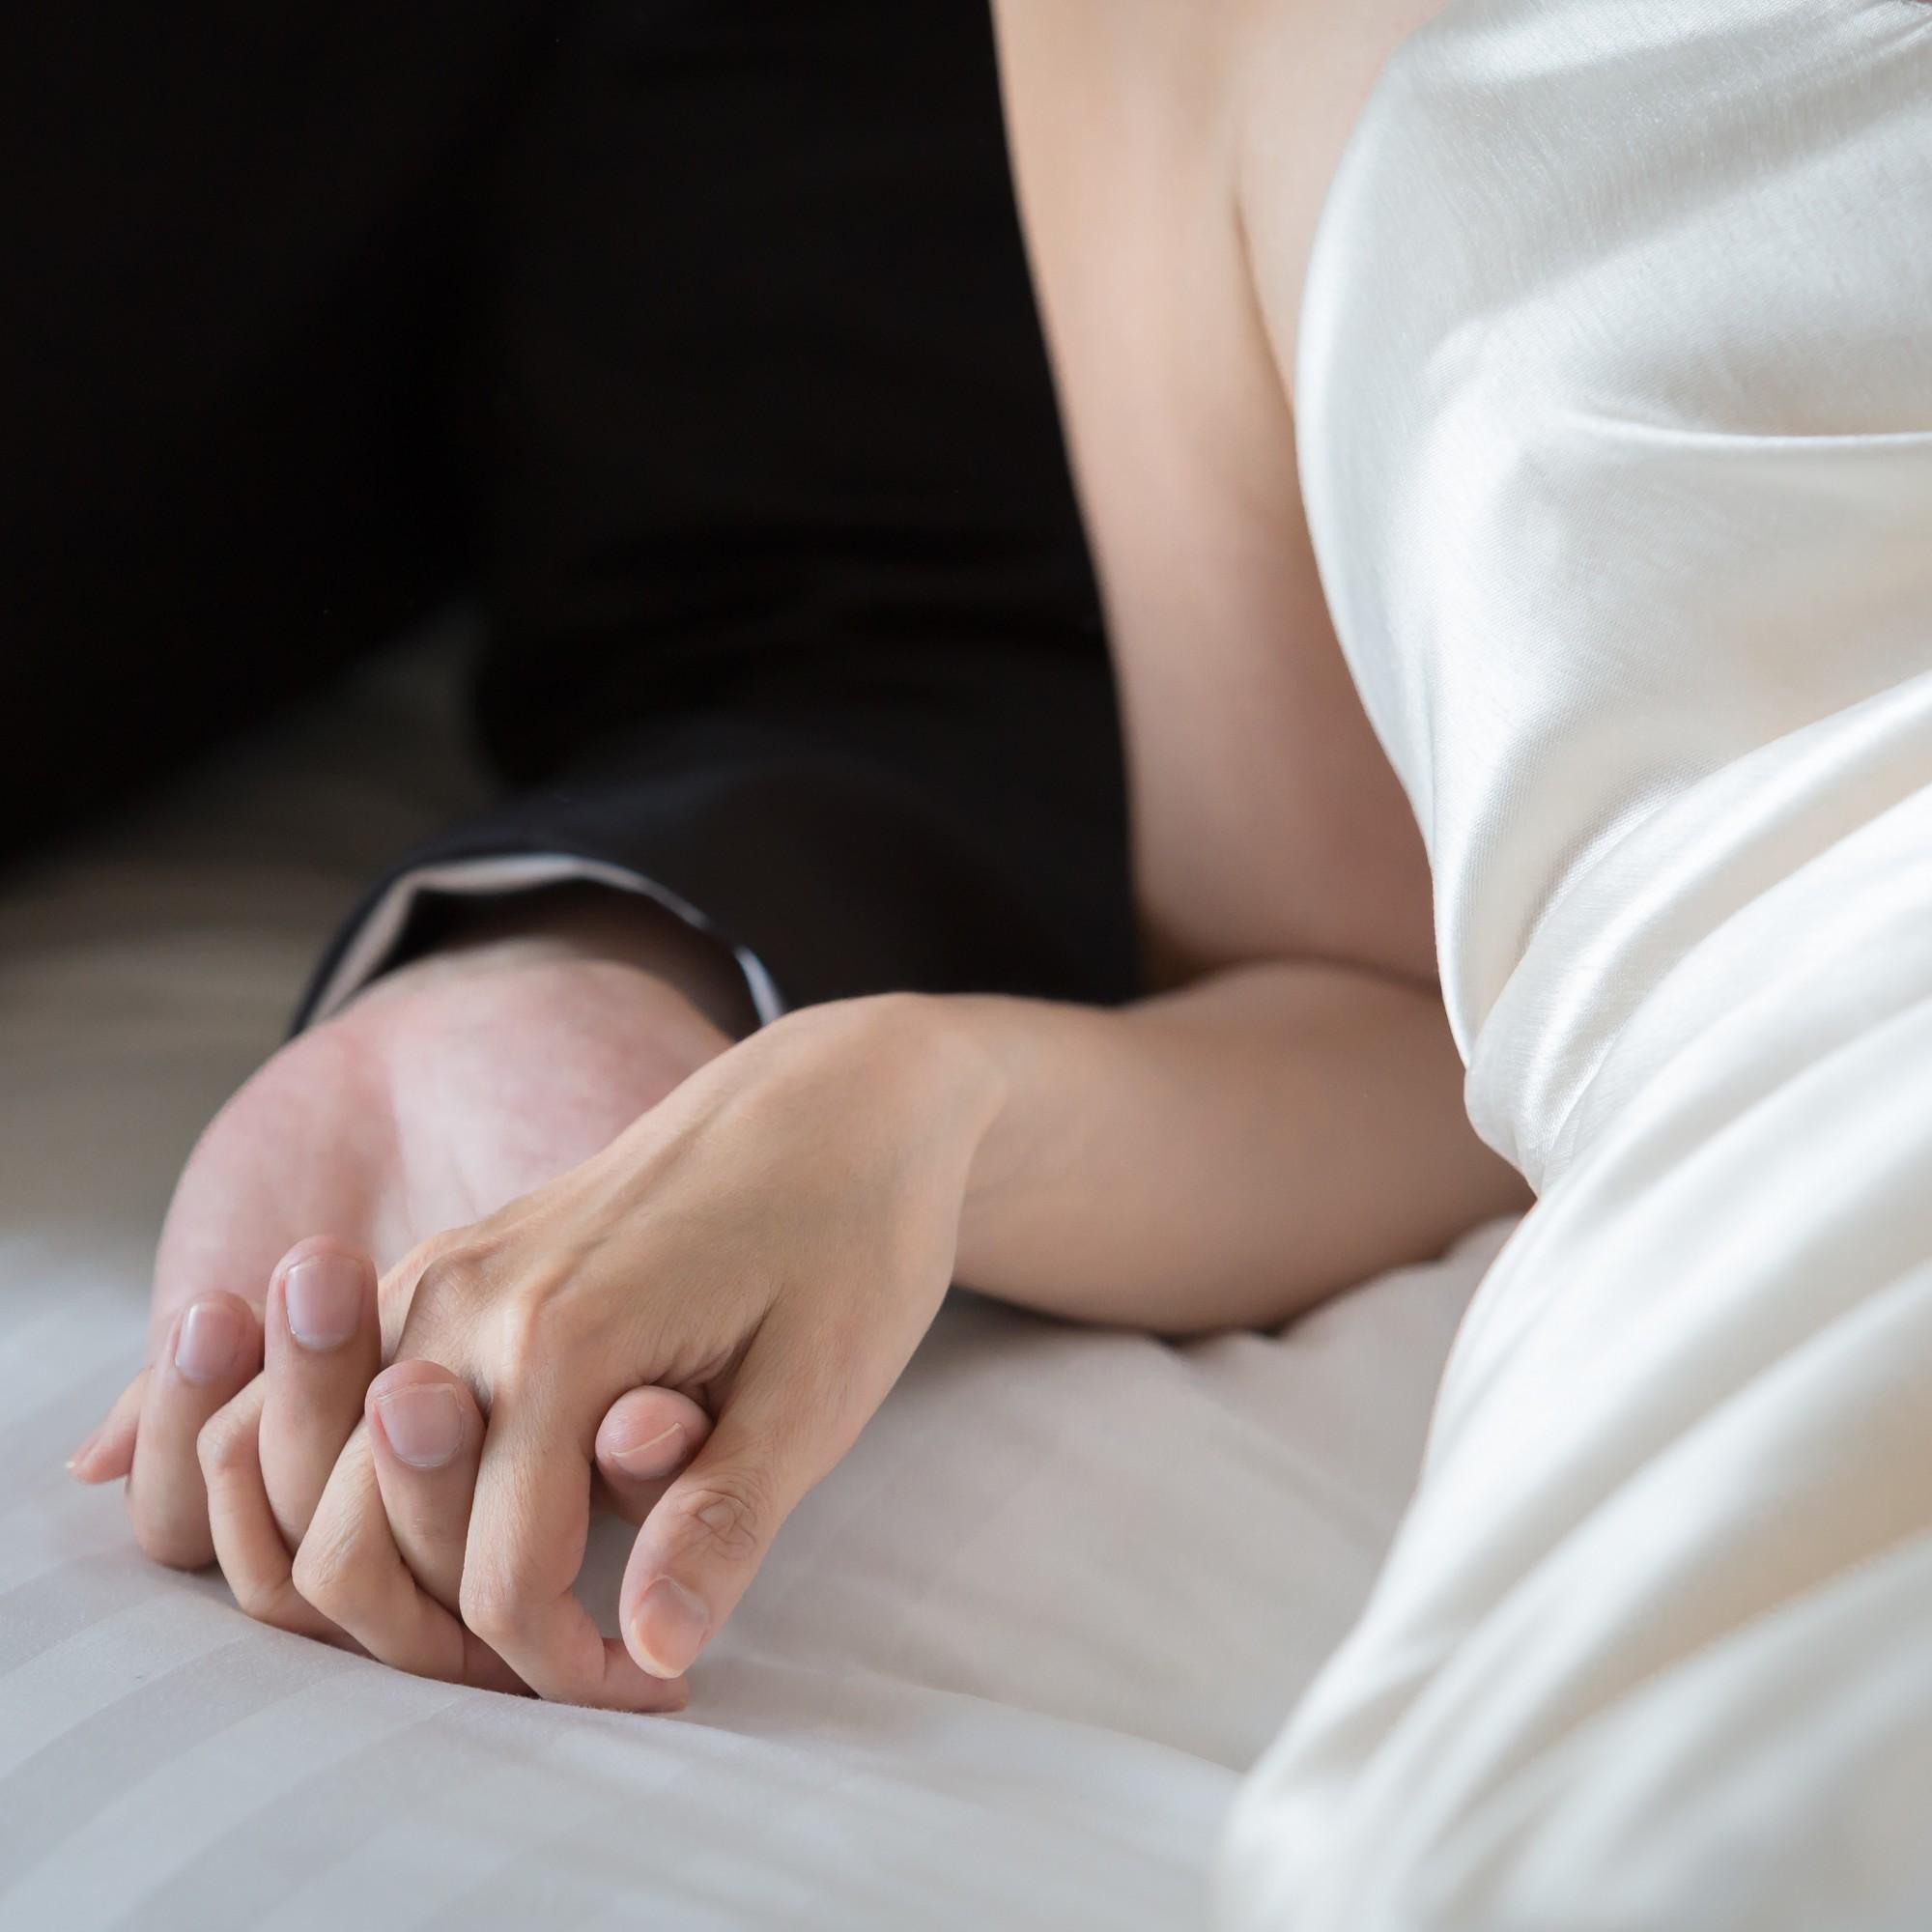 Why one Irish girl signed up to date 'sugar daddies'